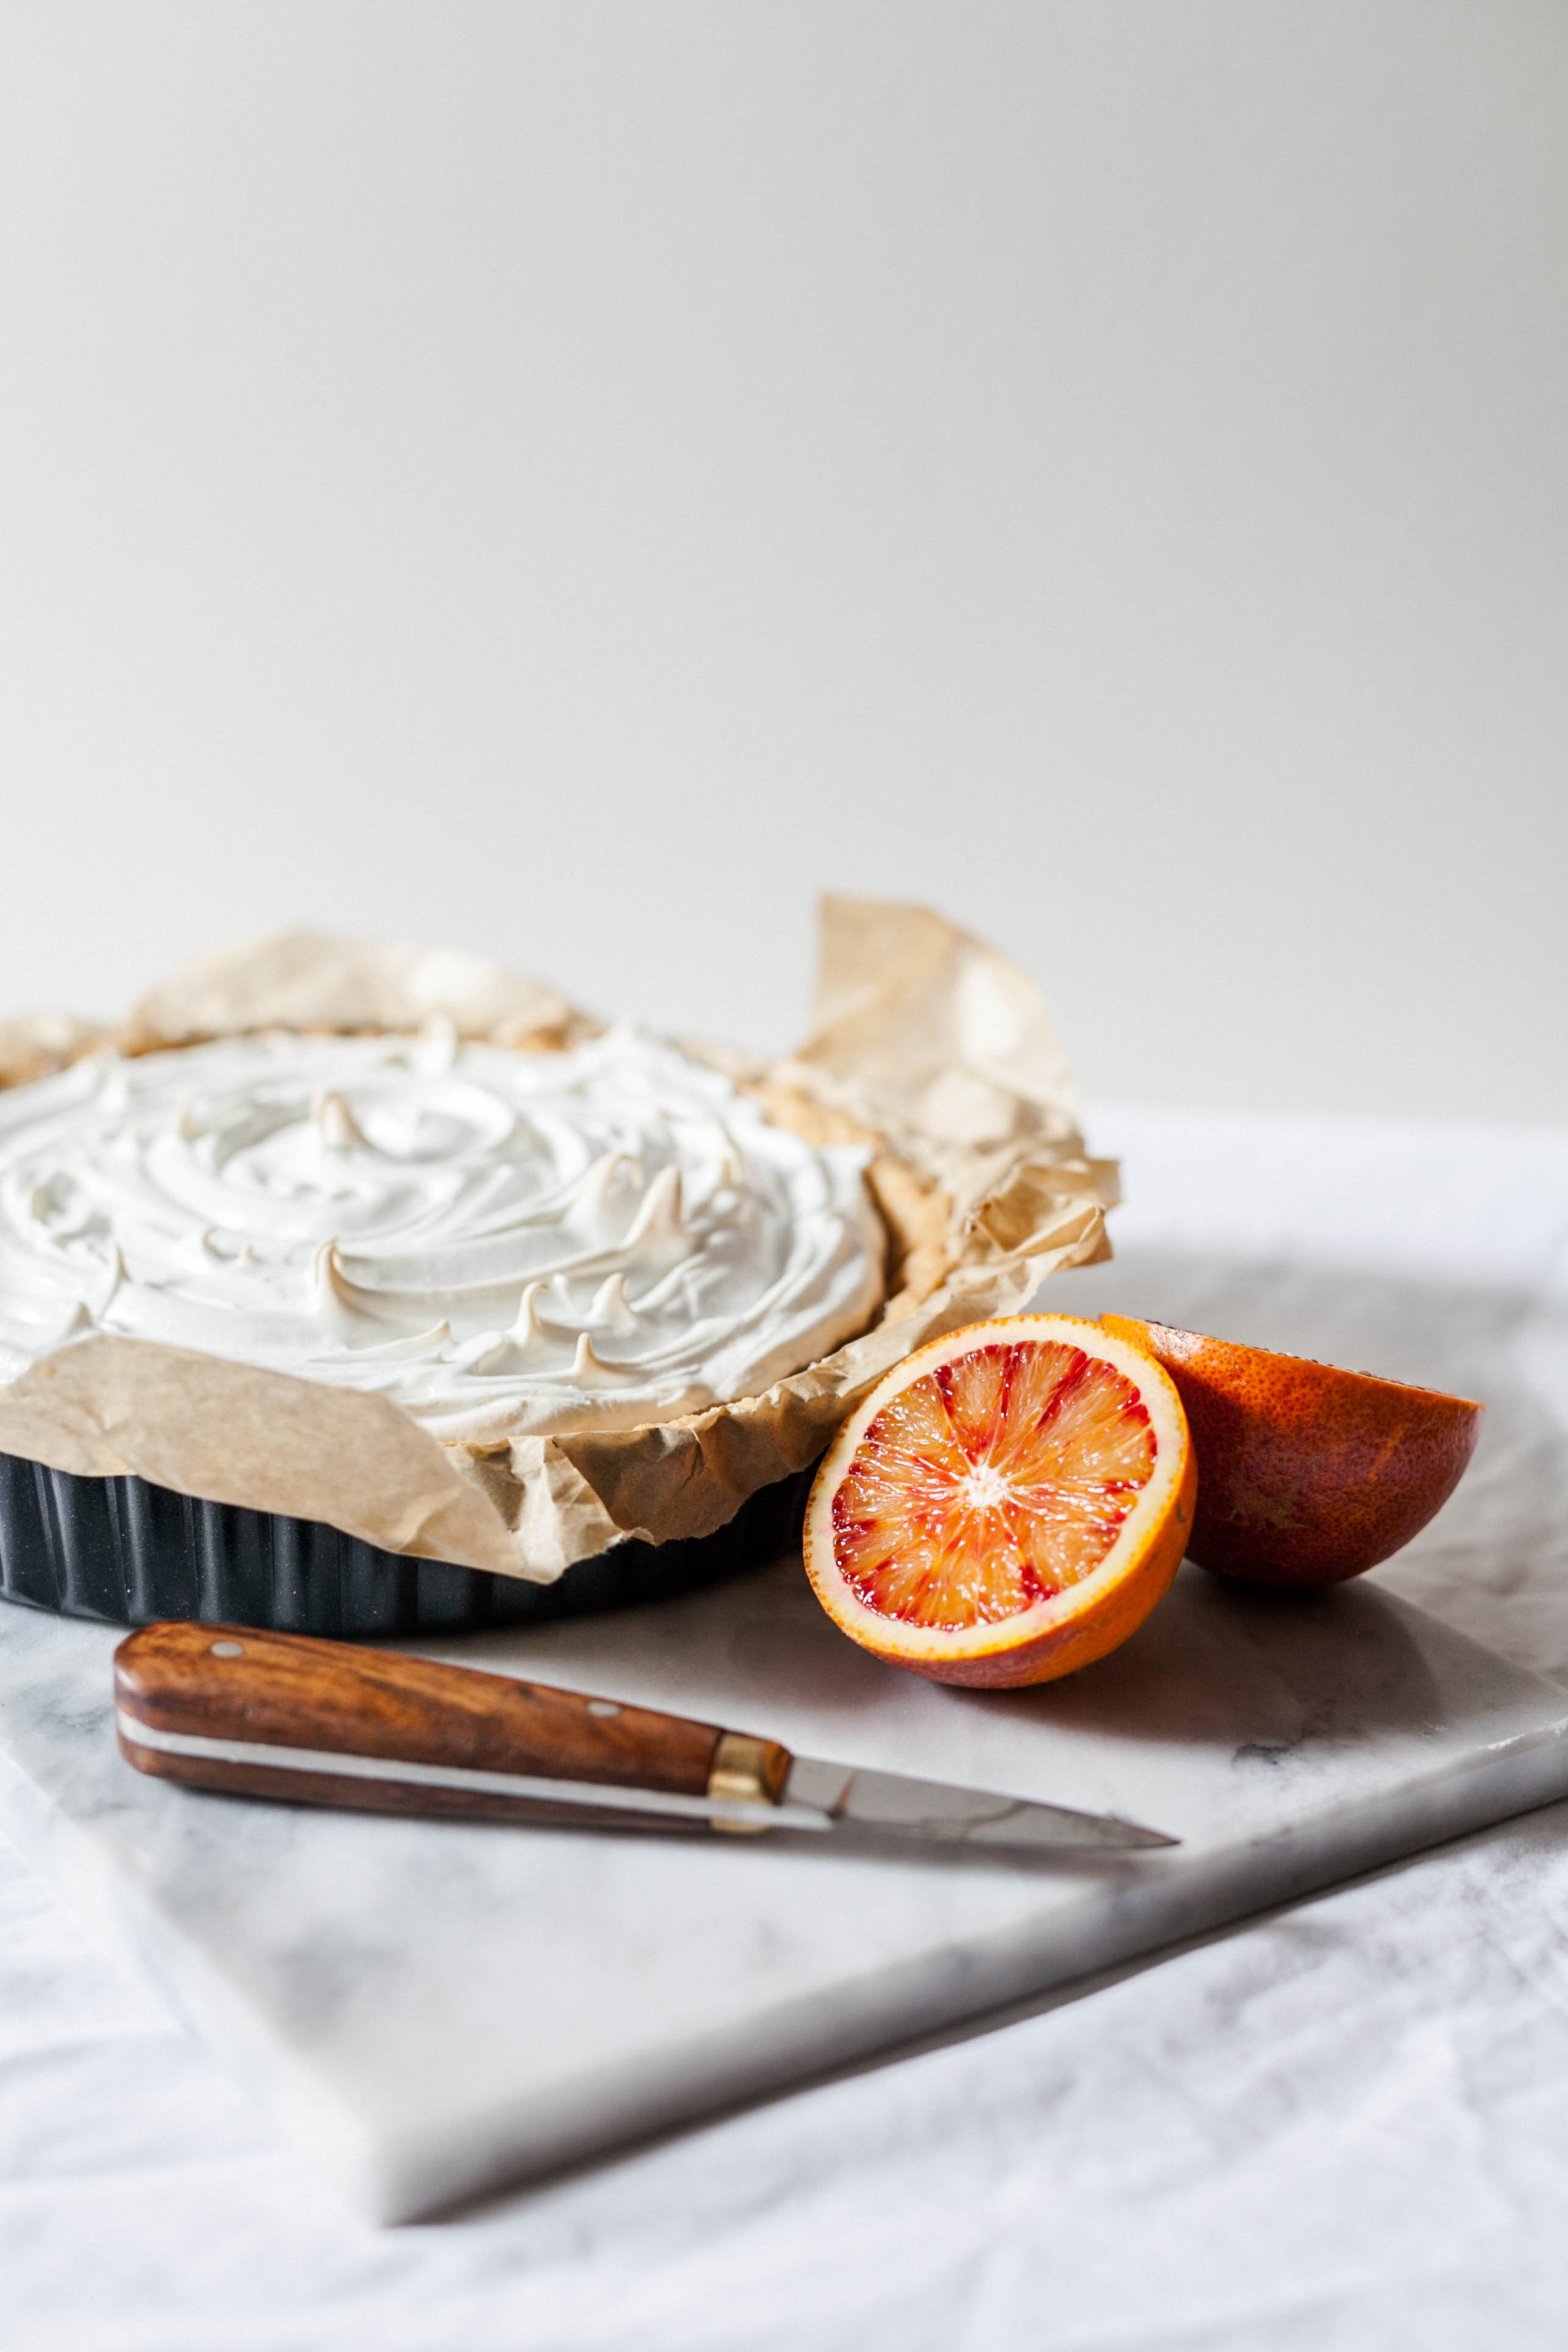 sliced orange fruits and white cupcake